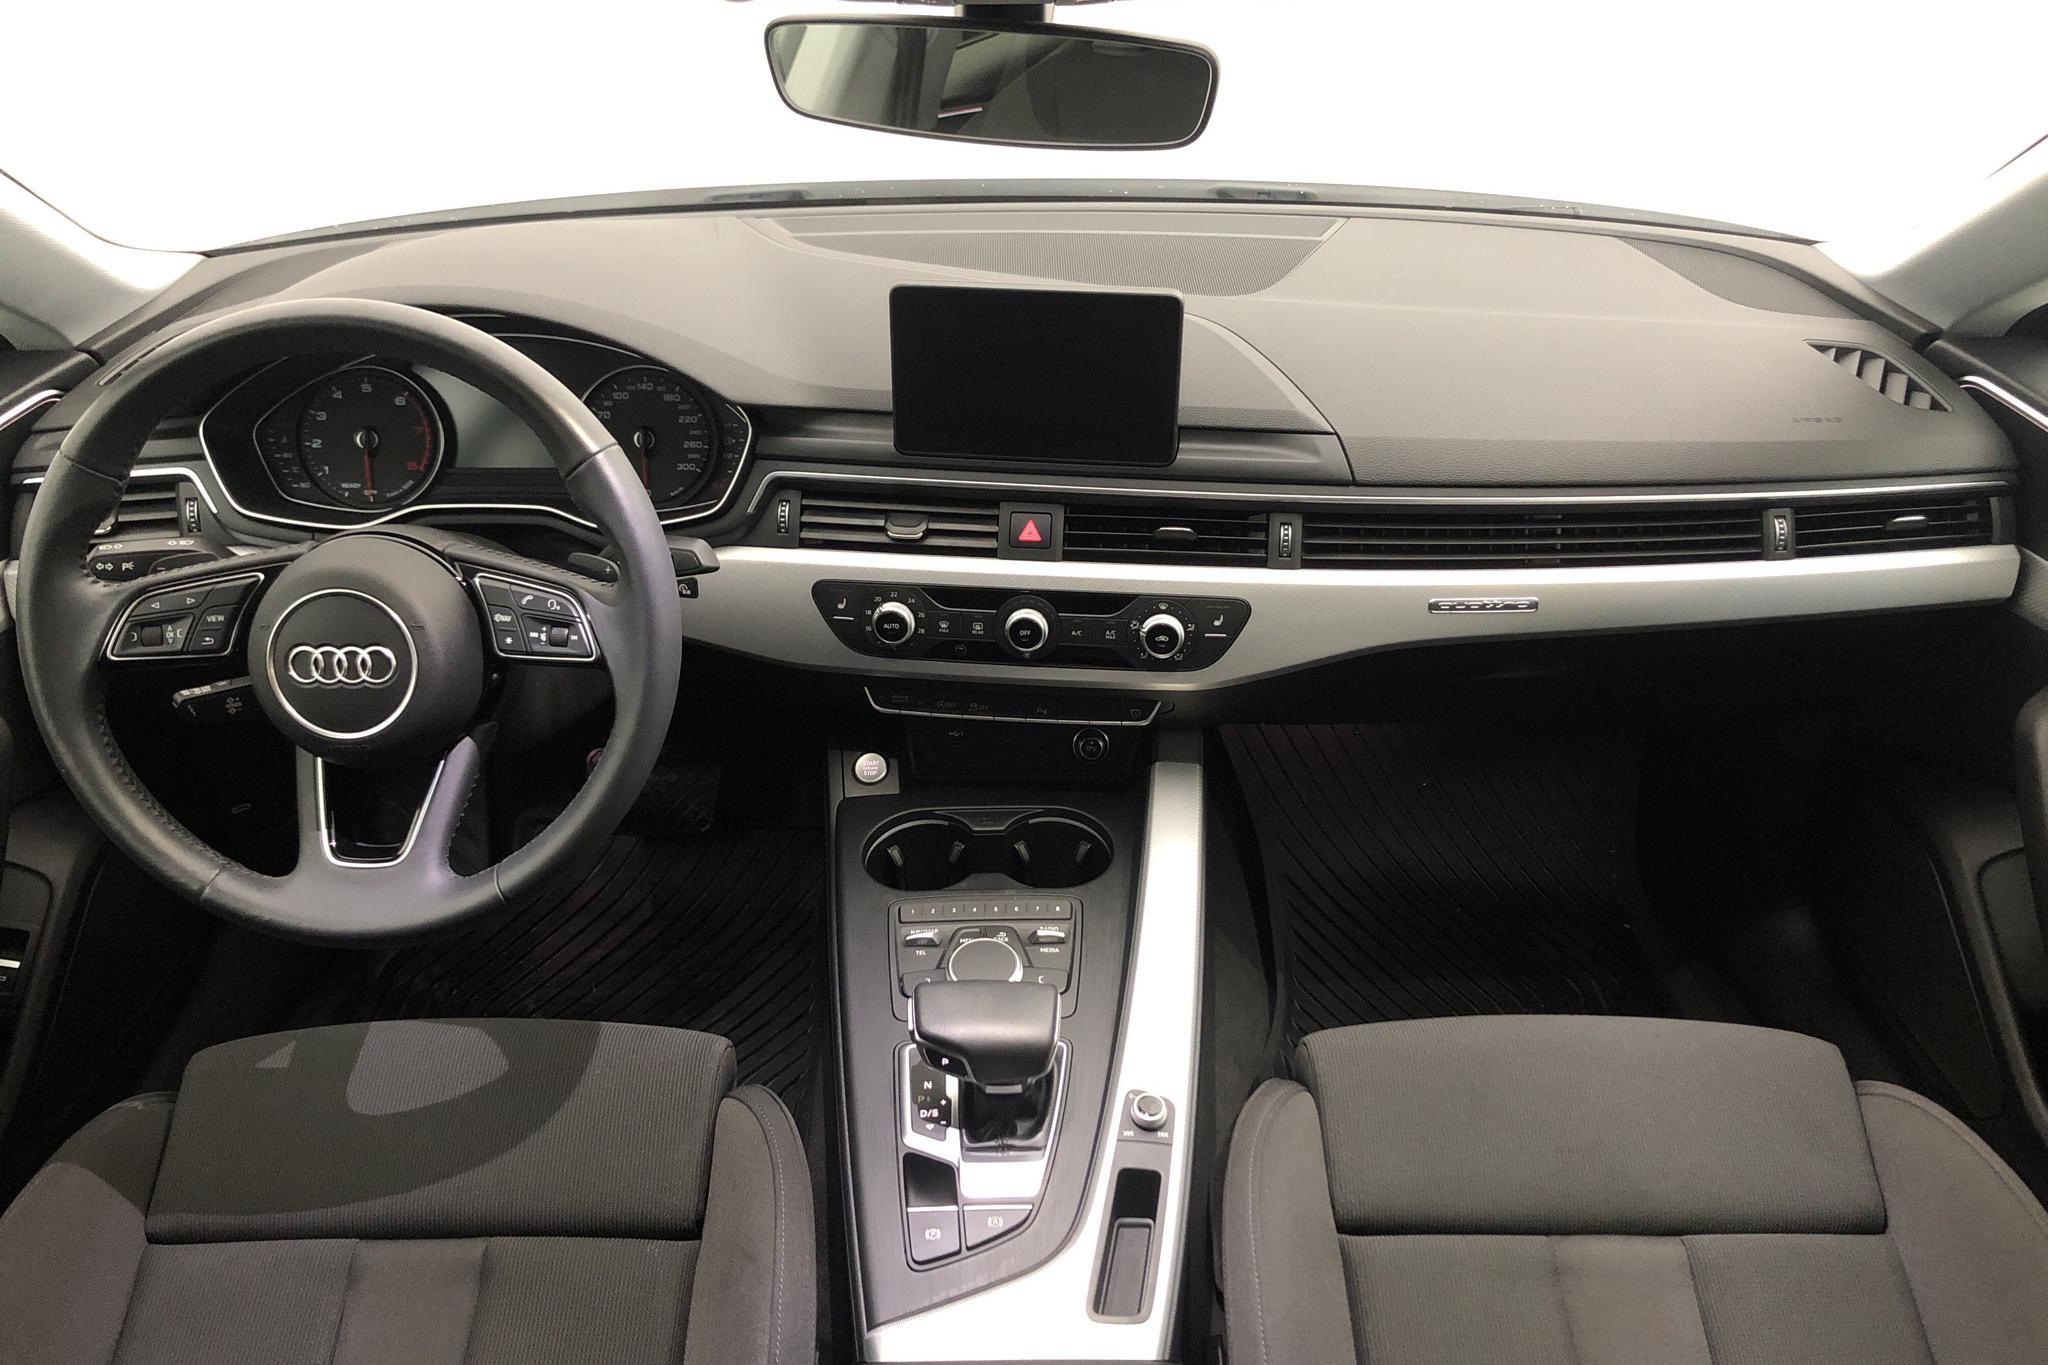 Audi A5 Sportback 45 TFSI quattro (245hk) - 13 370 km - Automatic - white - 2019